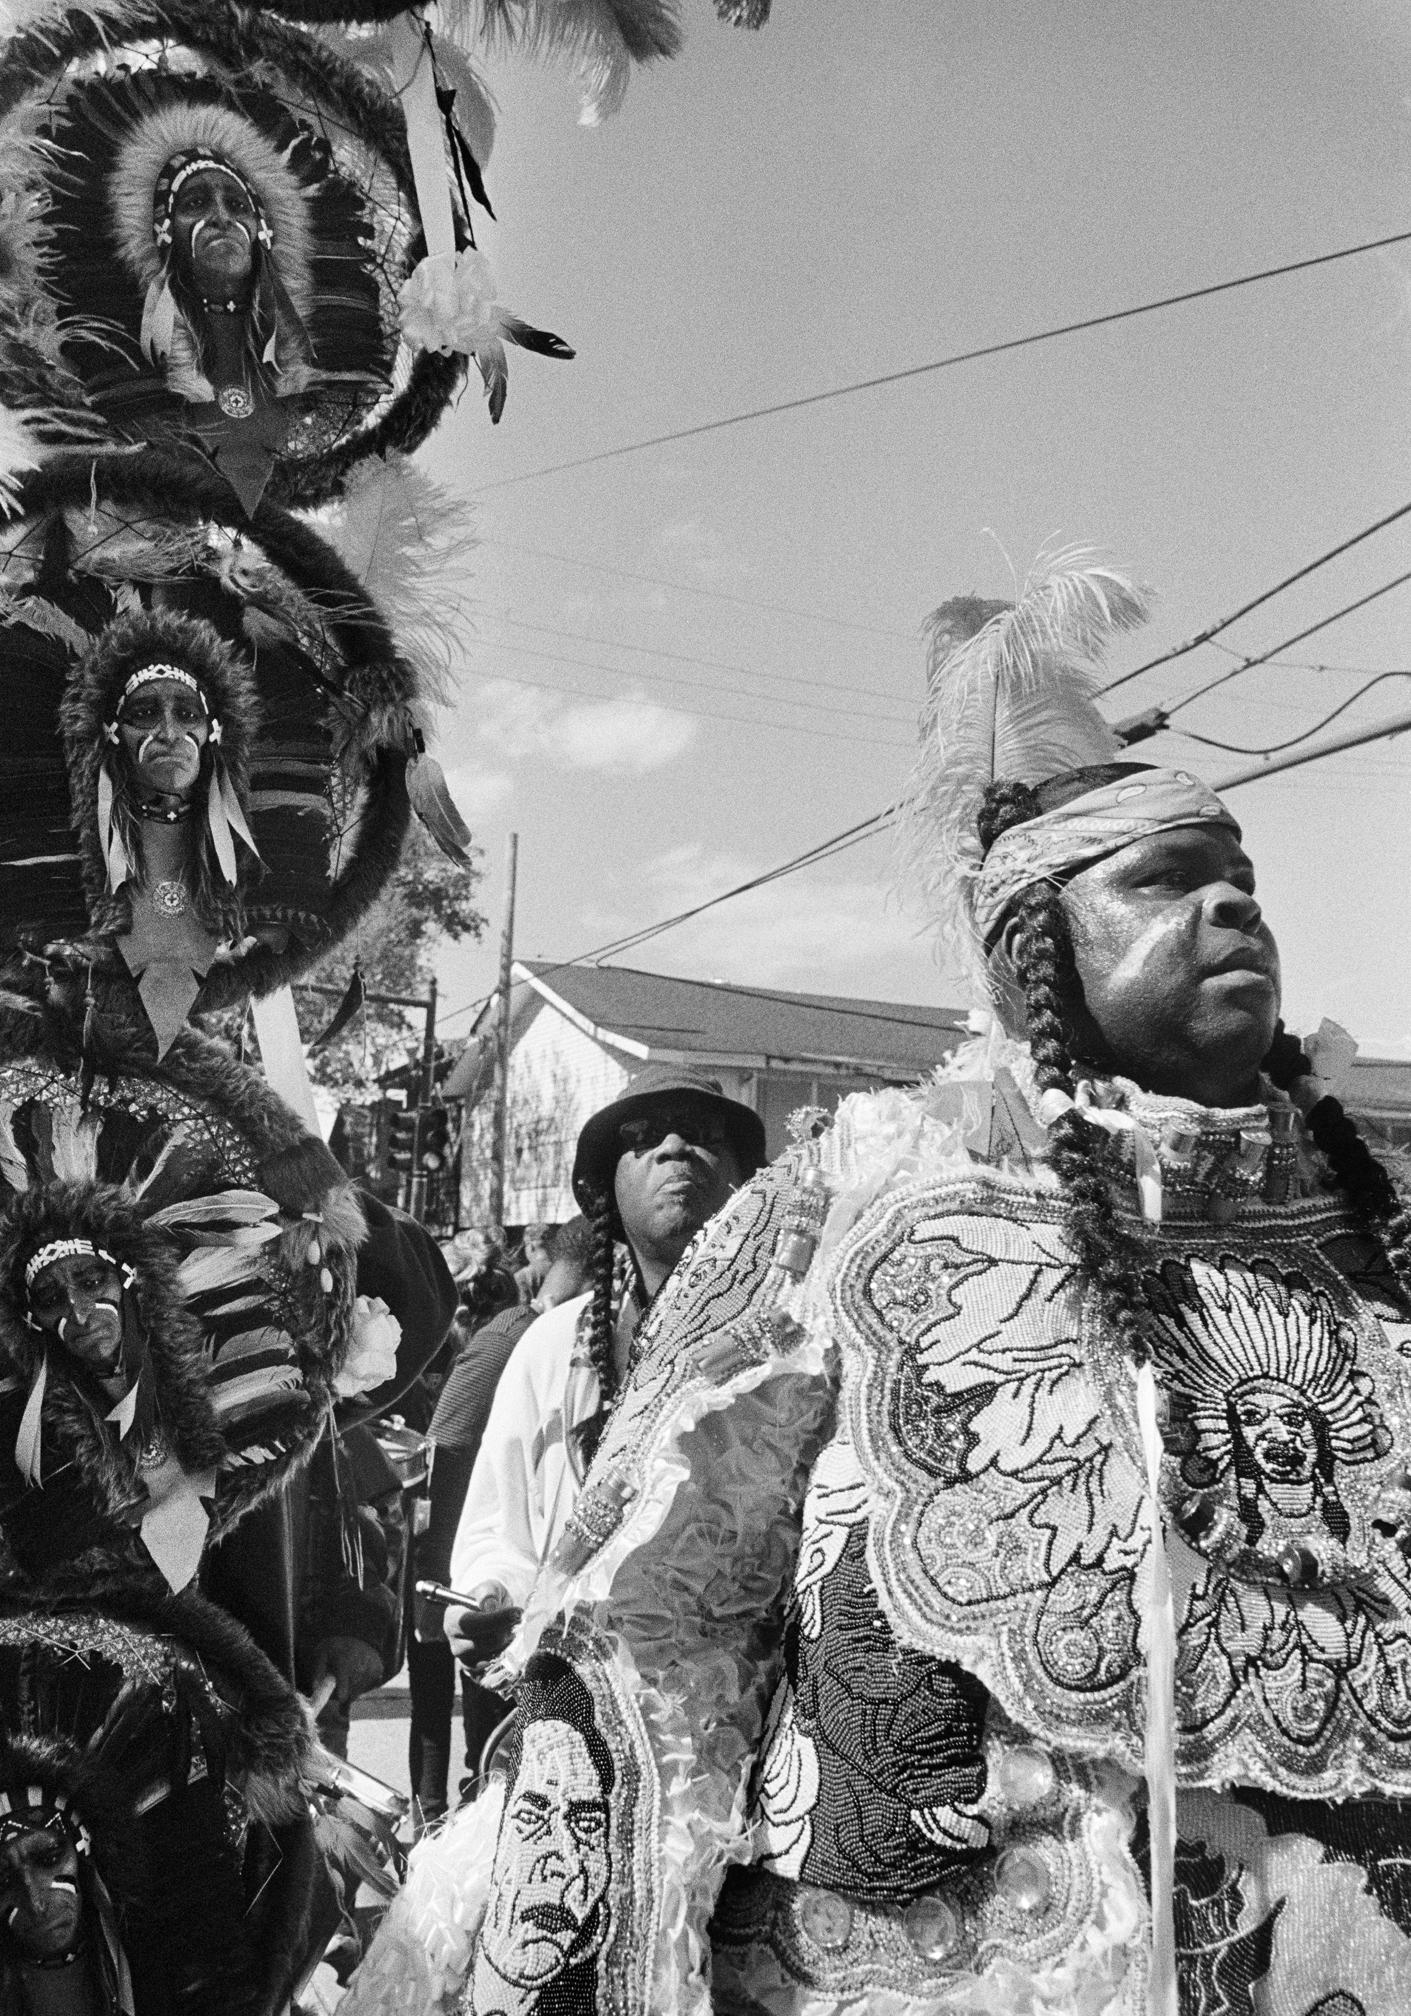 Mardi Gras Indians' Super Sunday, New Orleans